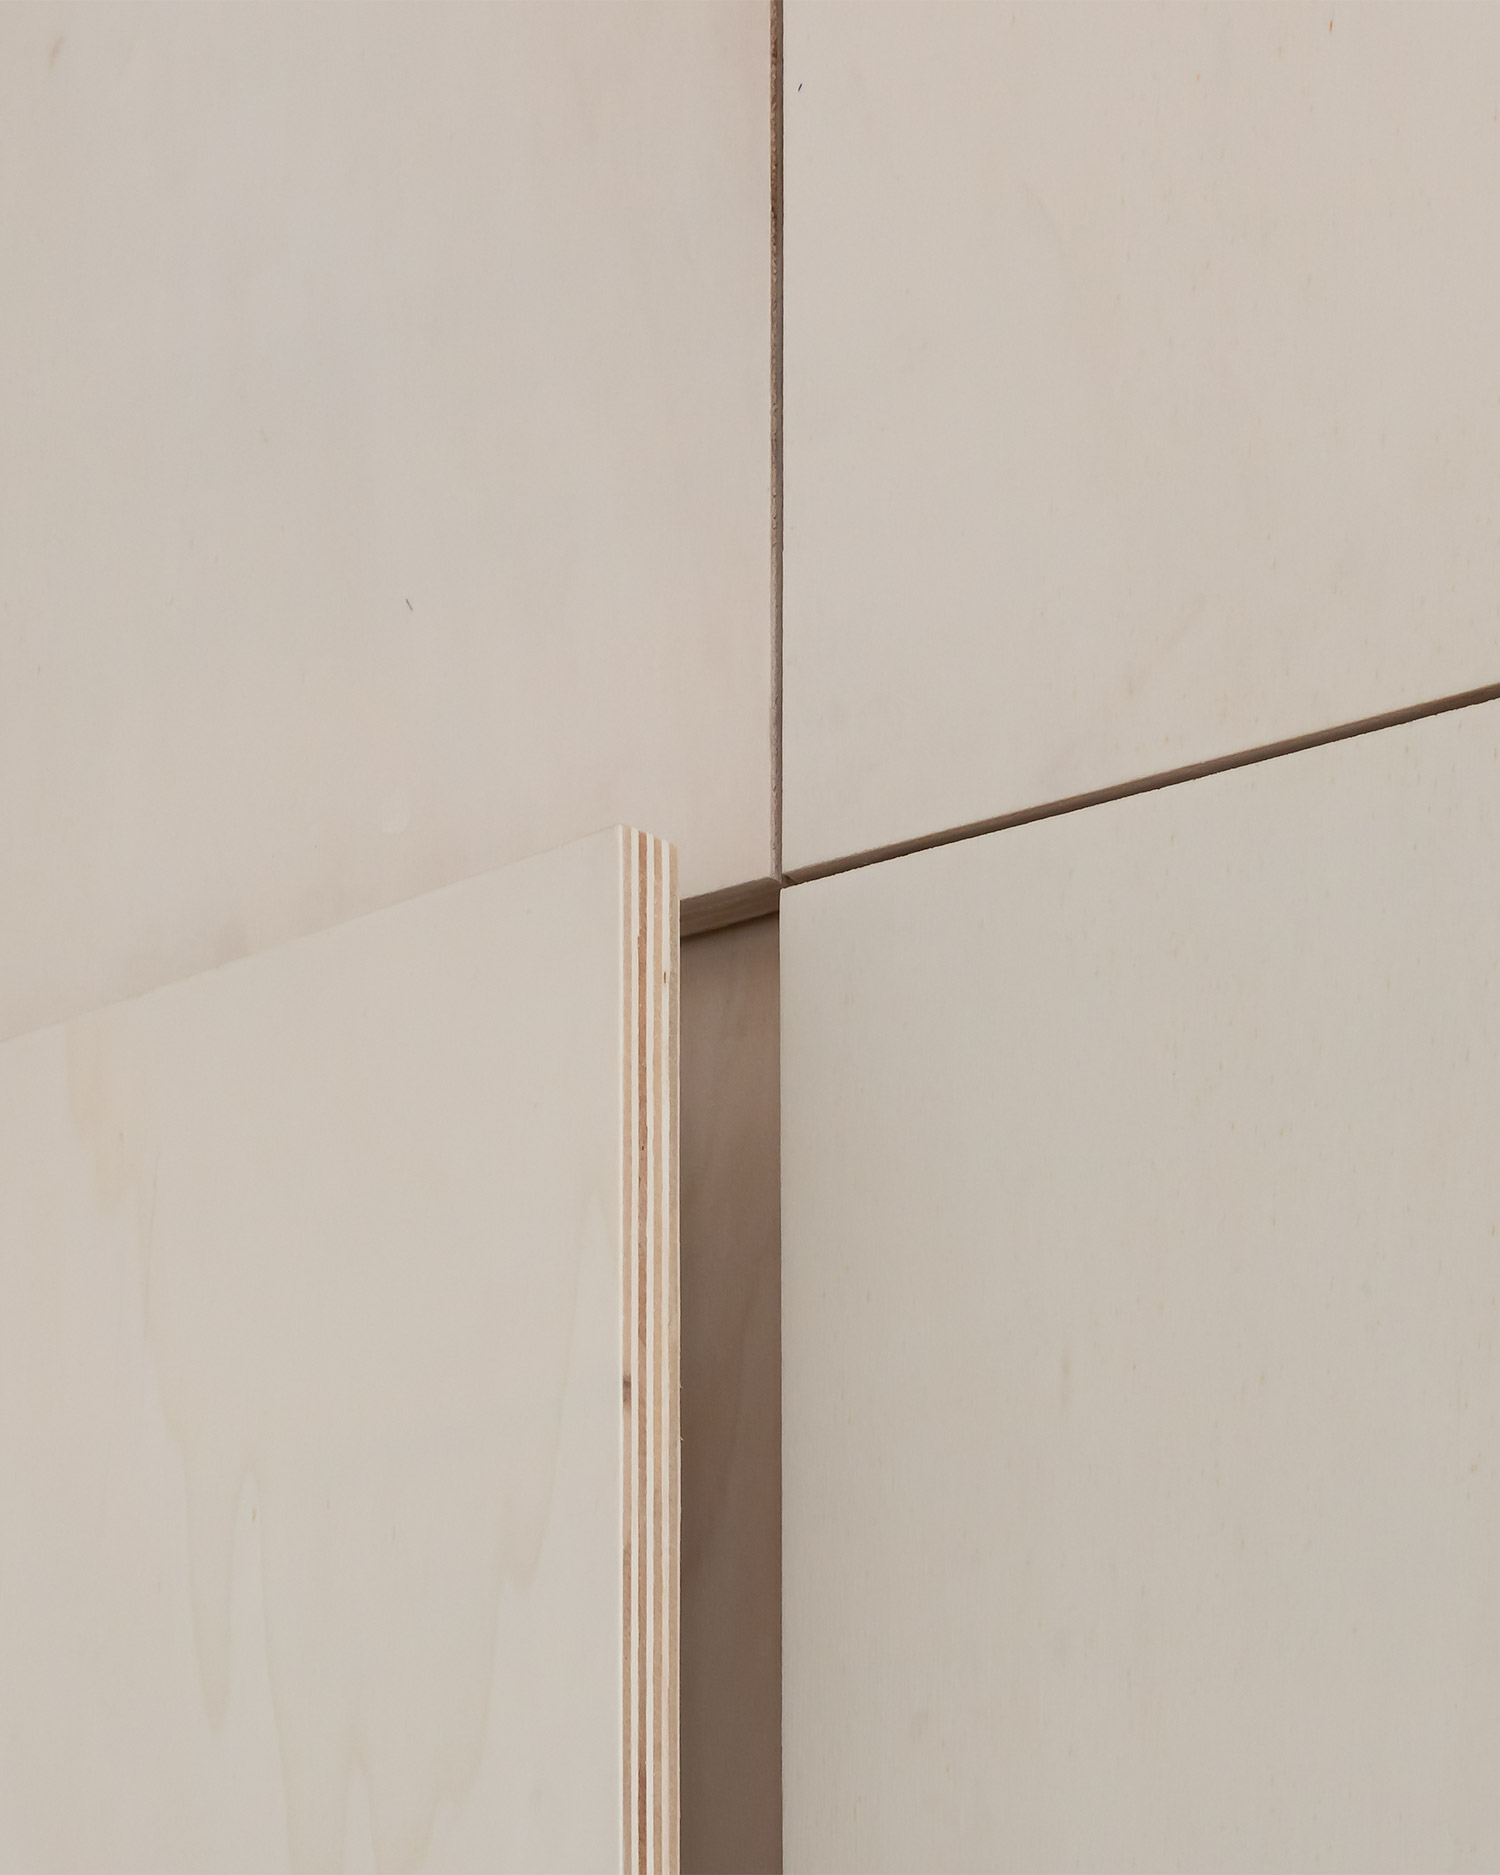 Plywood kitchen cabinet detail